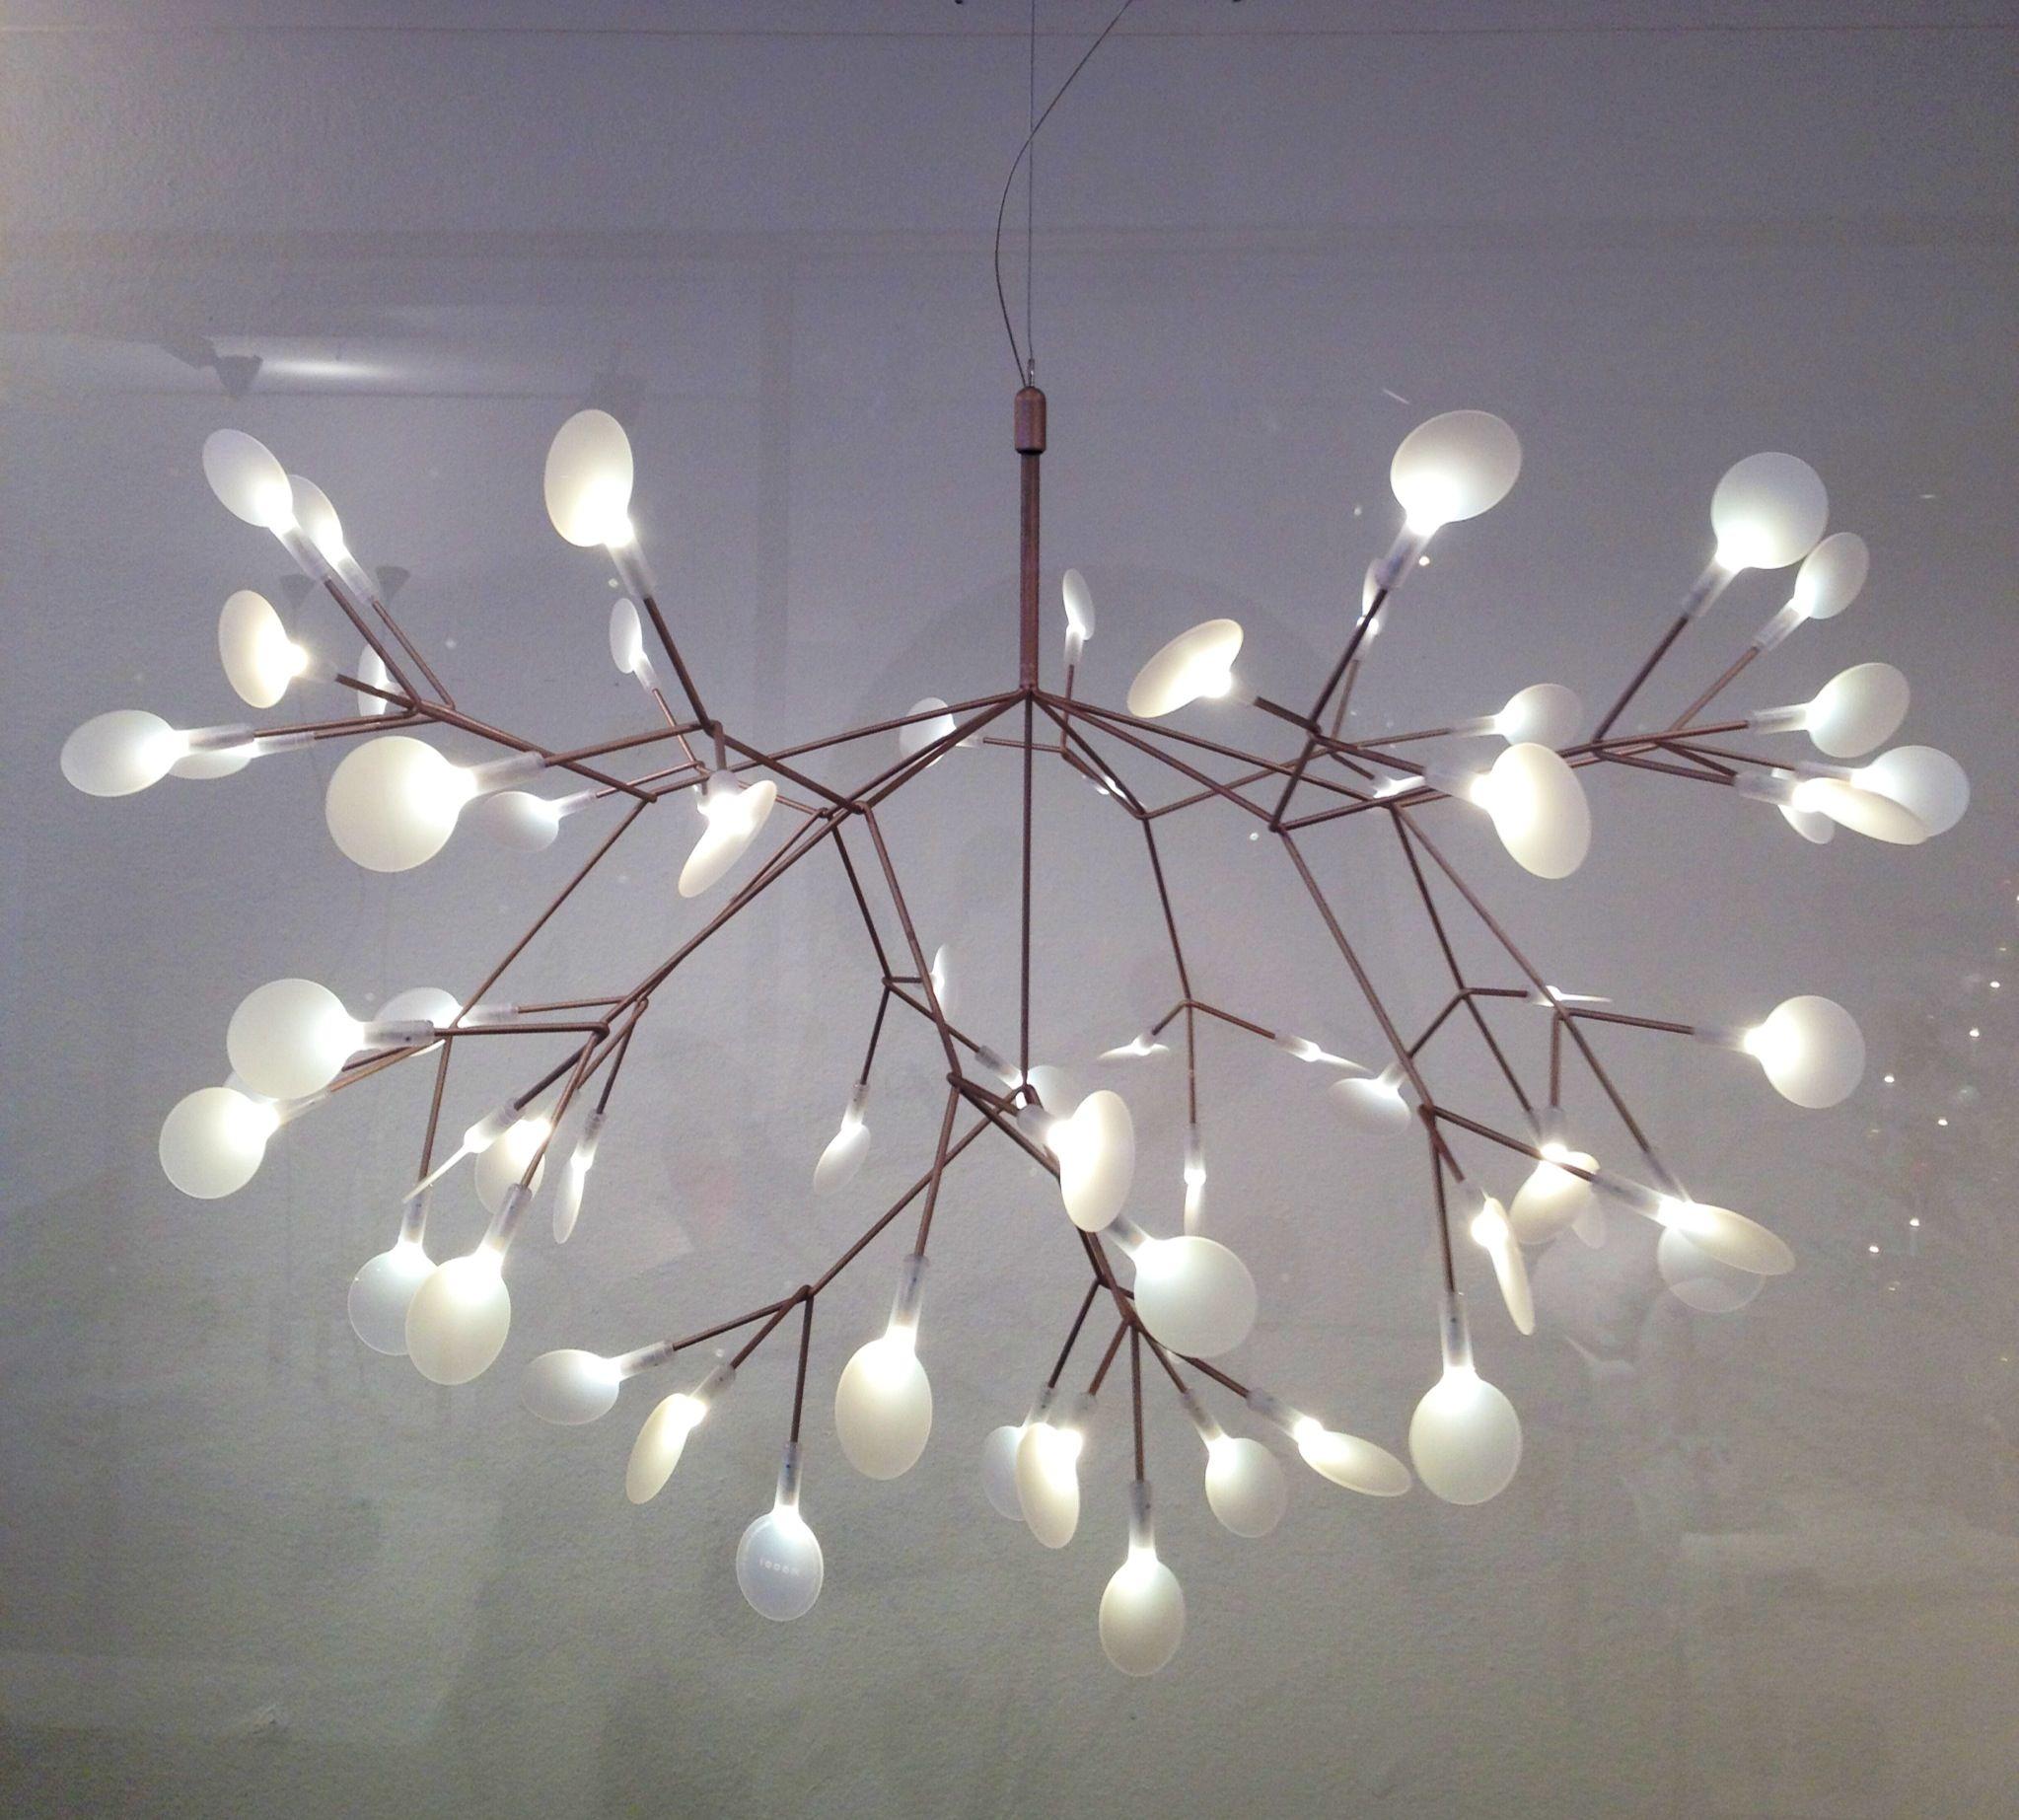 Leaf lamp nordiska galleriet stockholm interior design inredning leaf lamp nordiska galleriet stockholm arubaitofo Choice Image